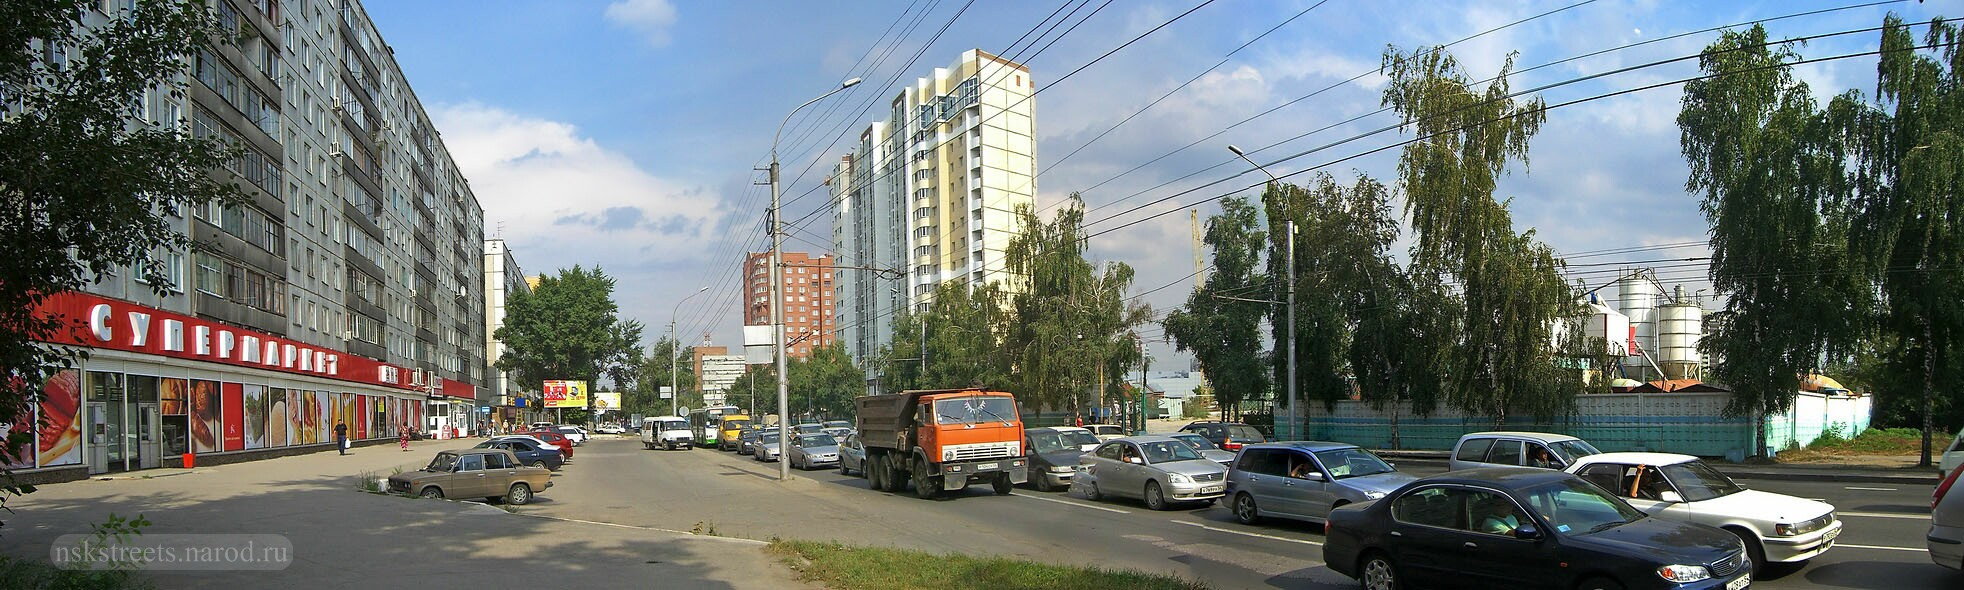 http://nskstreets.narod.ru/image15/Dusi_Kovalchuk_43.jpg